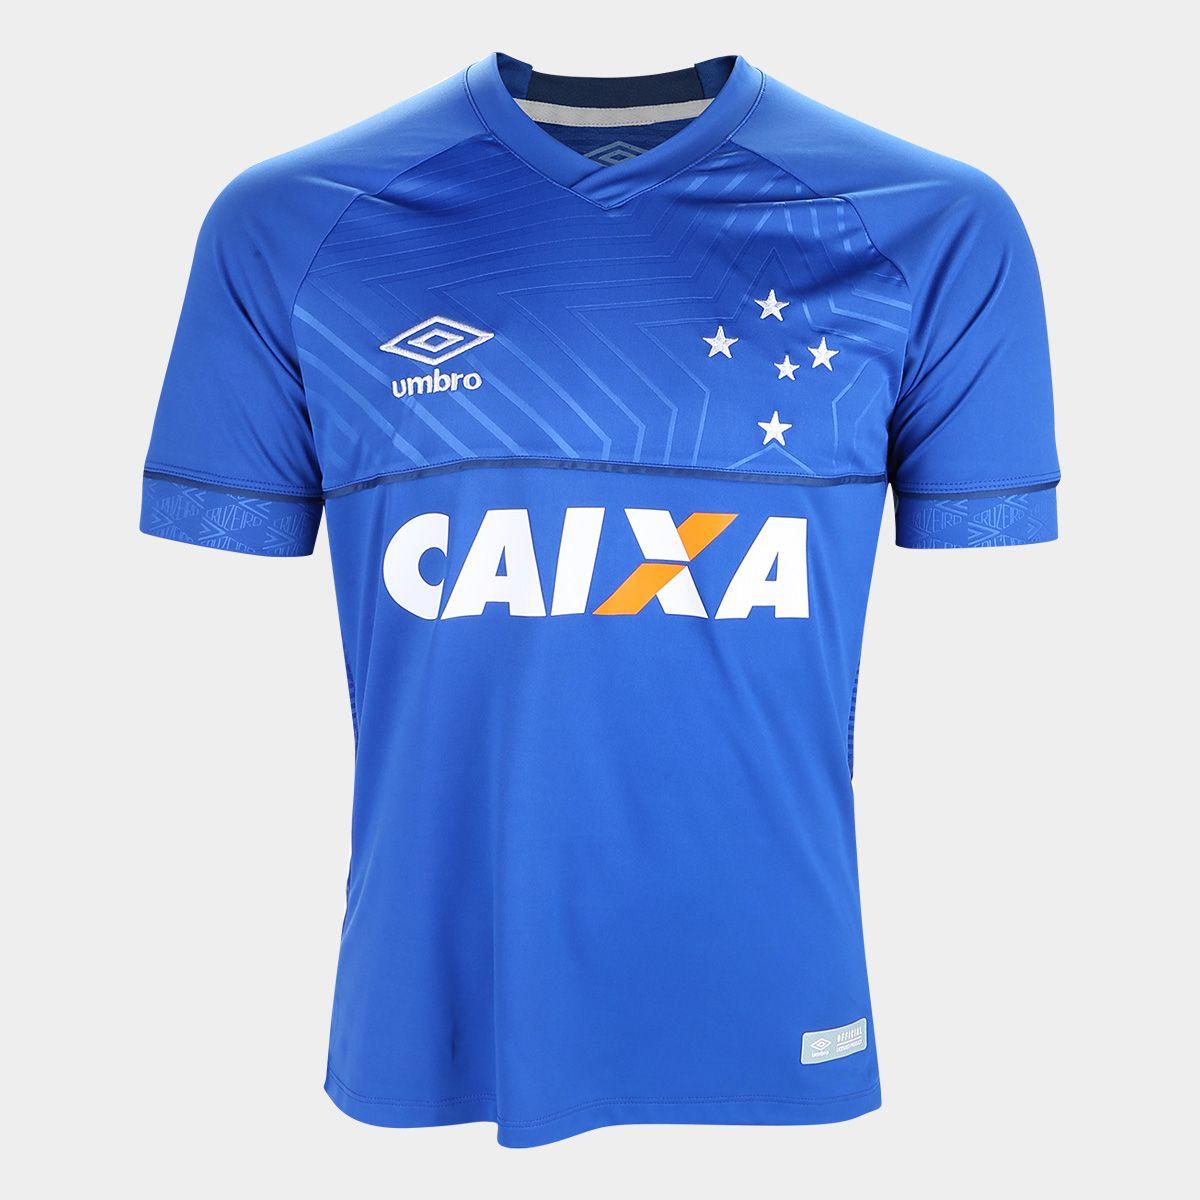 Camisa Cruzeiro I 18 19 s n° C  Patrocínio - Torcedor Umbro ... 8c47b1a51c3db